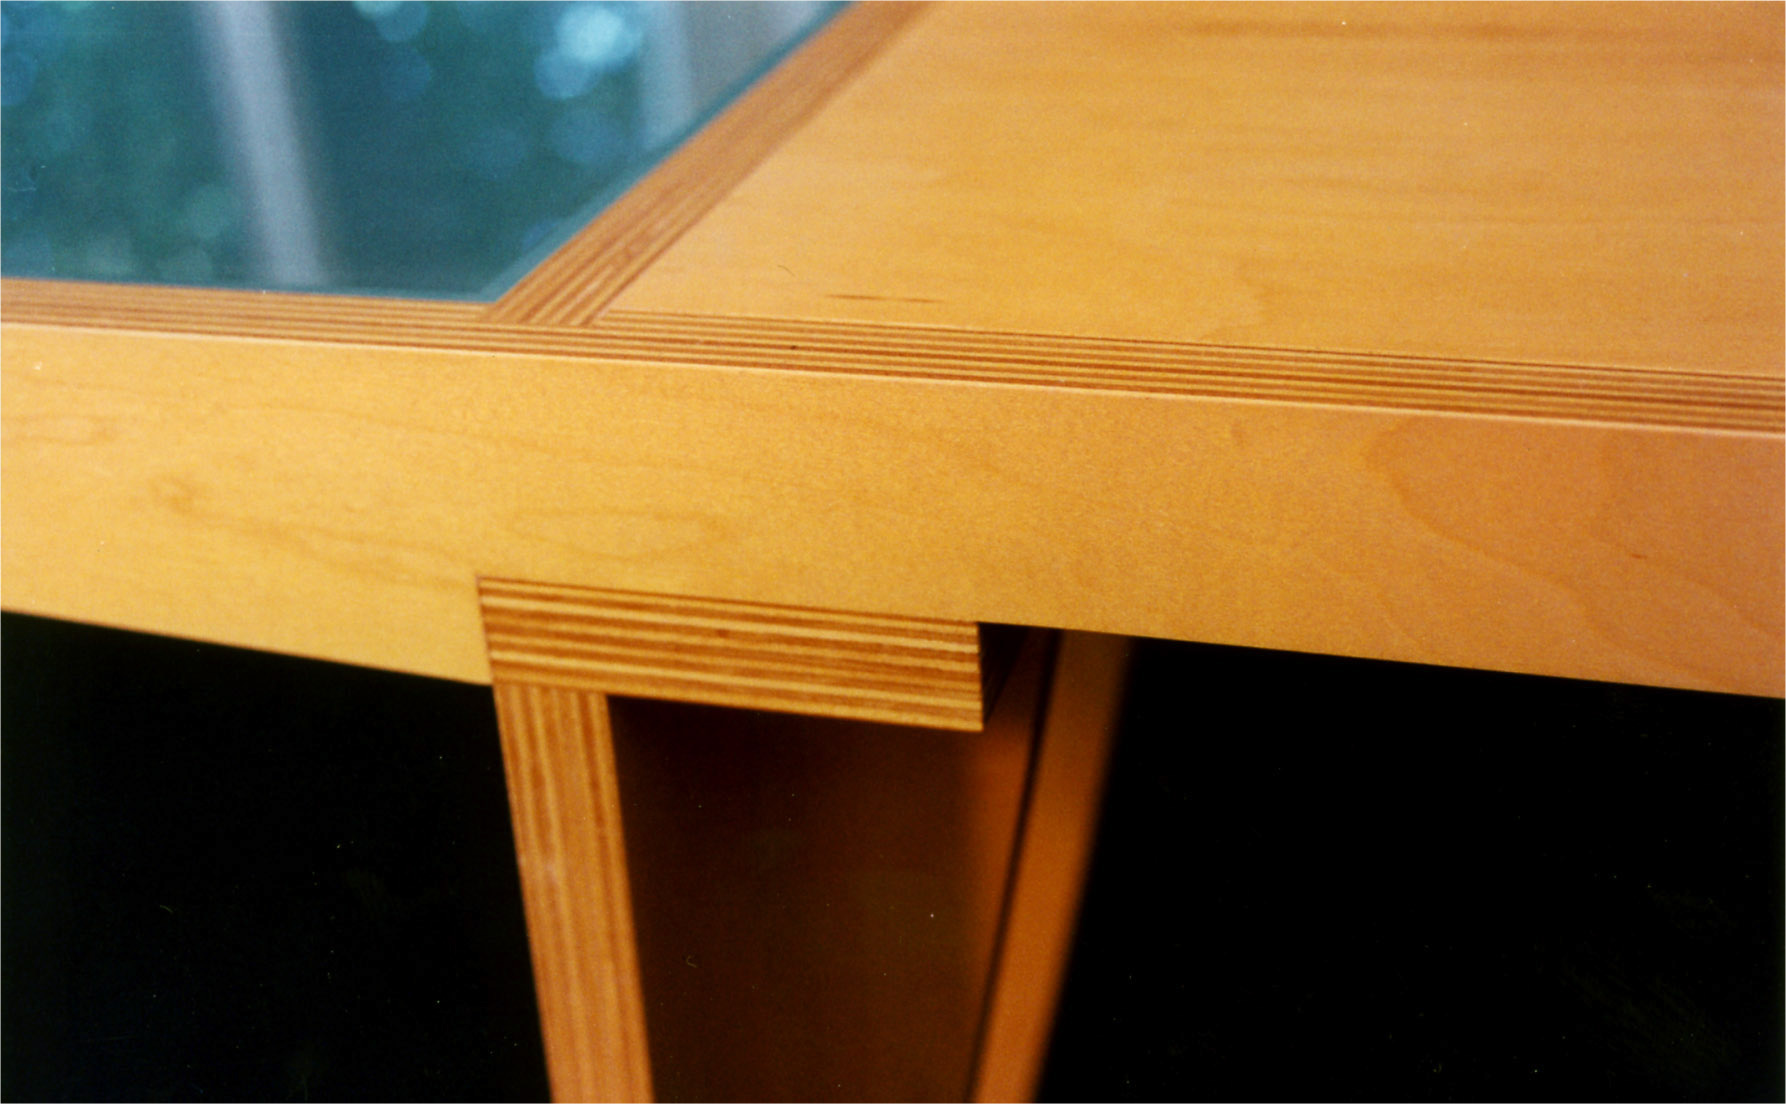 Furniture Glyph Wing Table 4.jpg